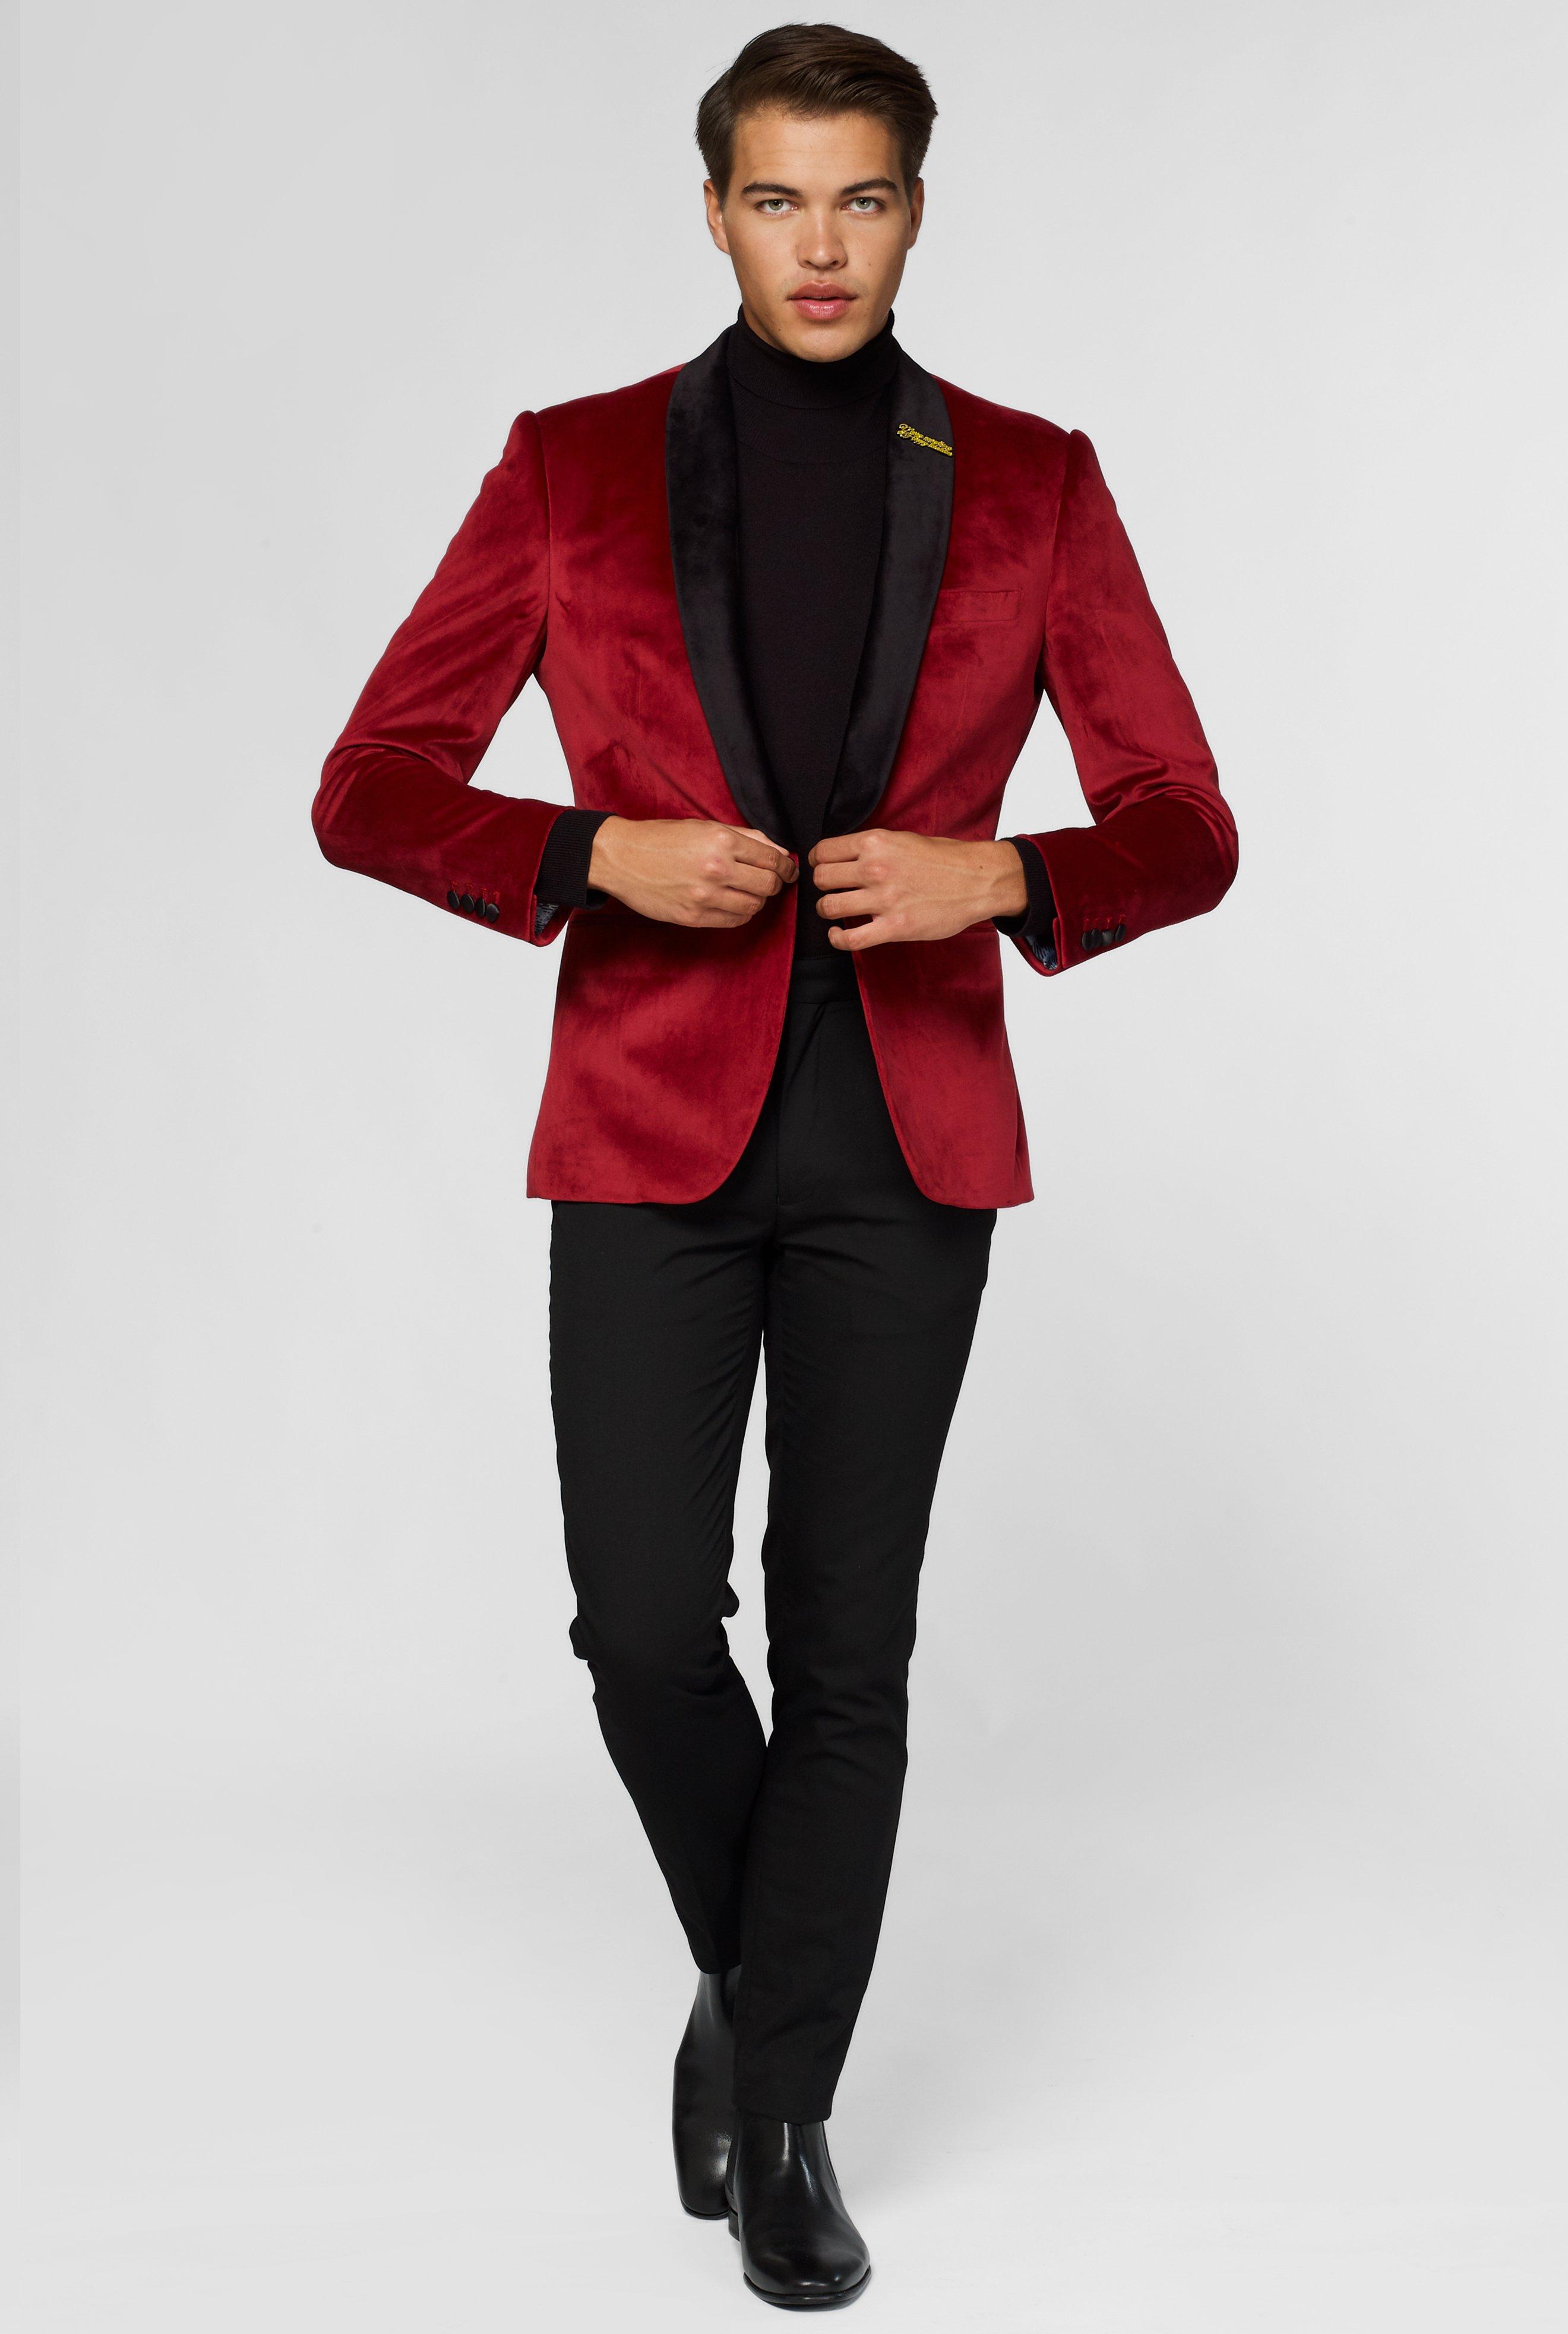 Velet-سترة بدلة رجالية مخصصة ، لون نبيذ أحمر ، ملابس الشارع النحيف ، تصميم سميك ، لحفلات الكوكتيل ، الزفاف ، أفضل بدلة رجالية